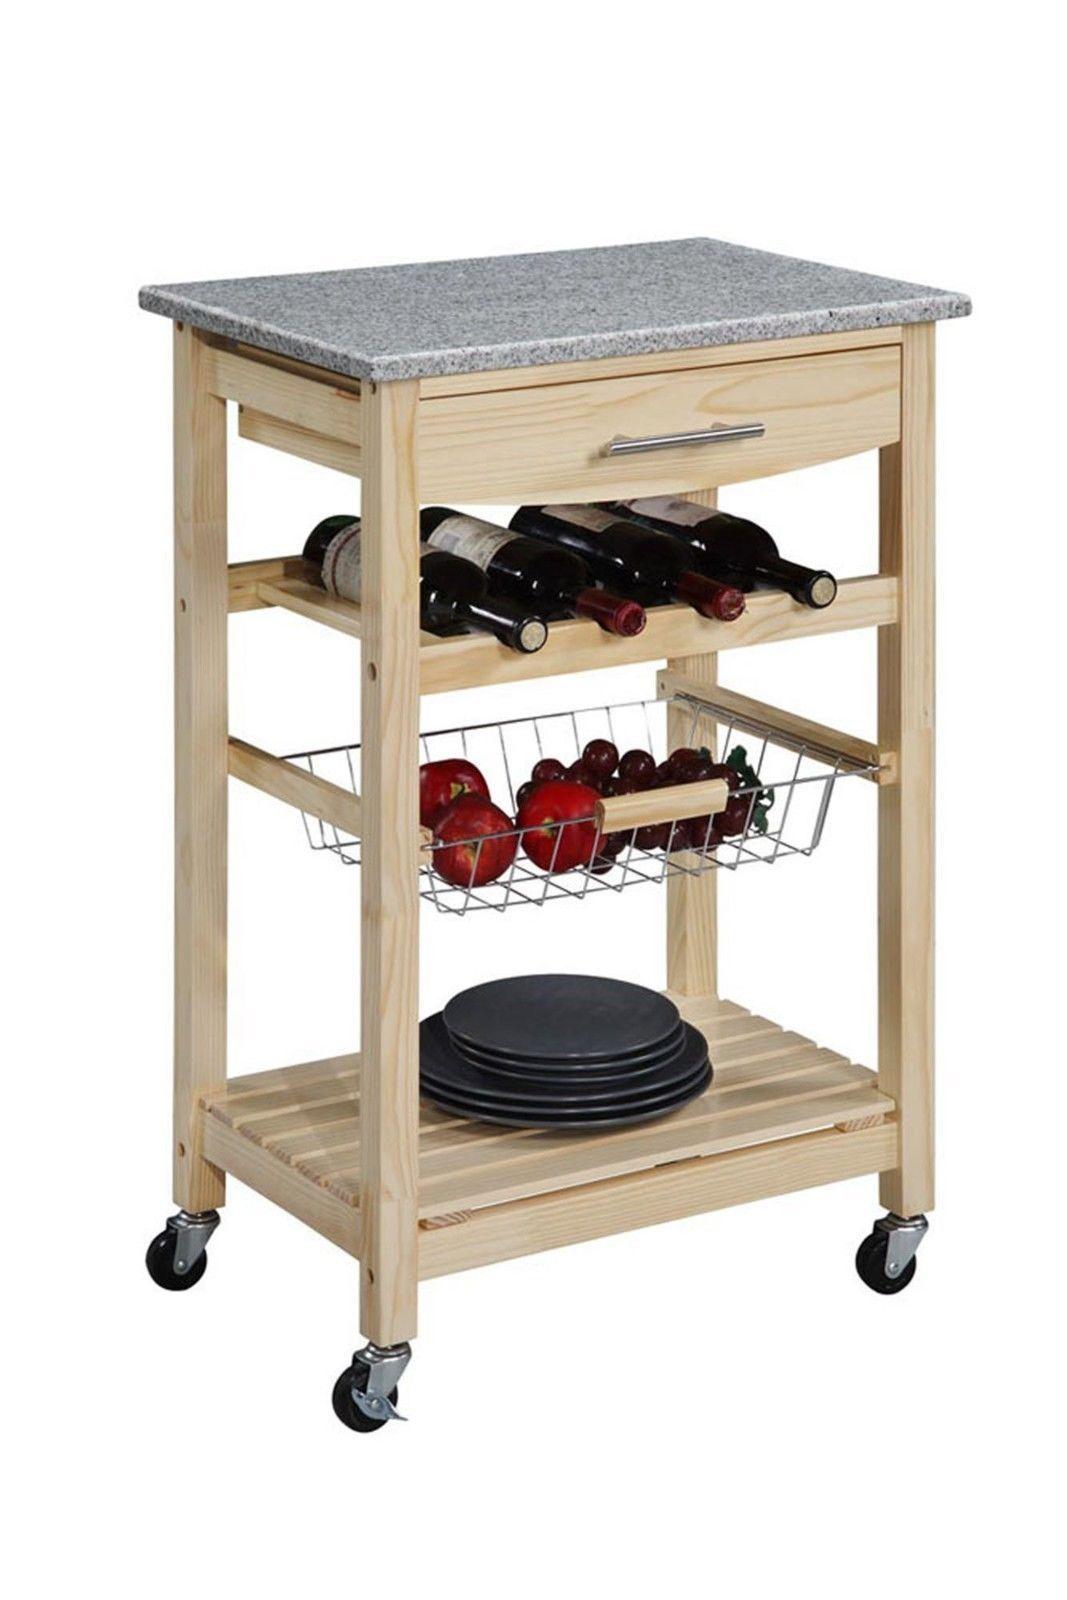 Wood Kitchen Cart | Wood Kitchen Trolley Cart Granite Top Rolling Storage Cabinet Dining